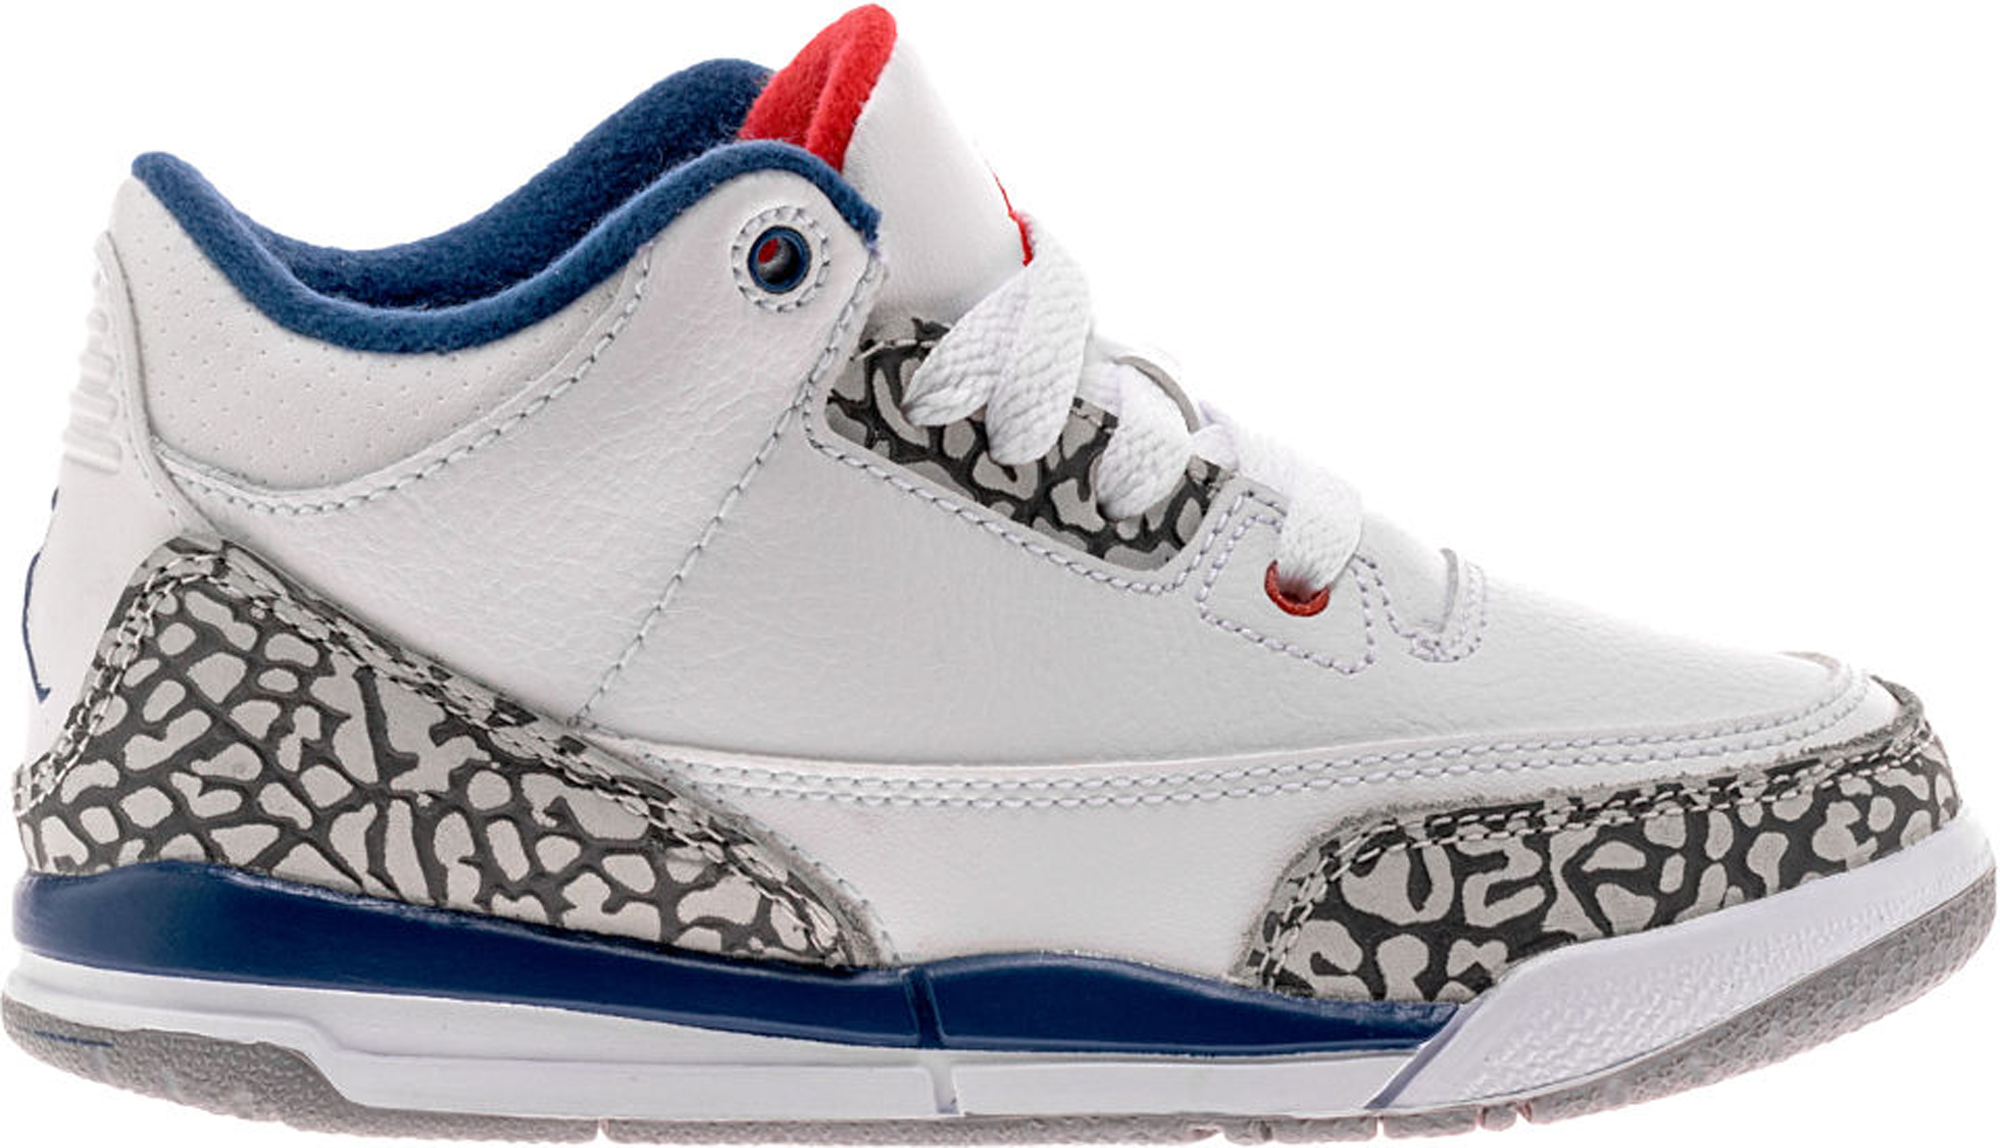 sneakers for cheap c4292 5f308 ... sale jordan 3 retro true blue 2016 ps 7aada f8829